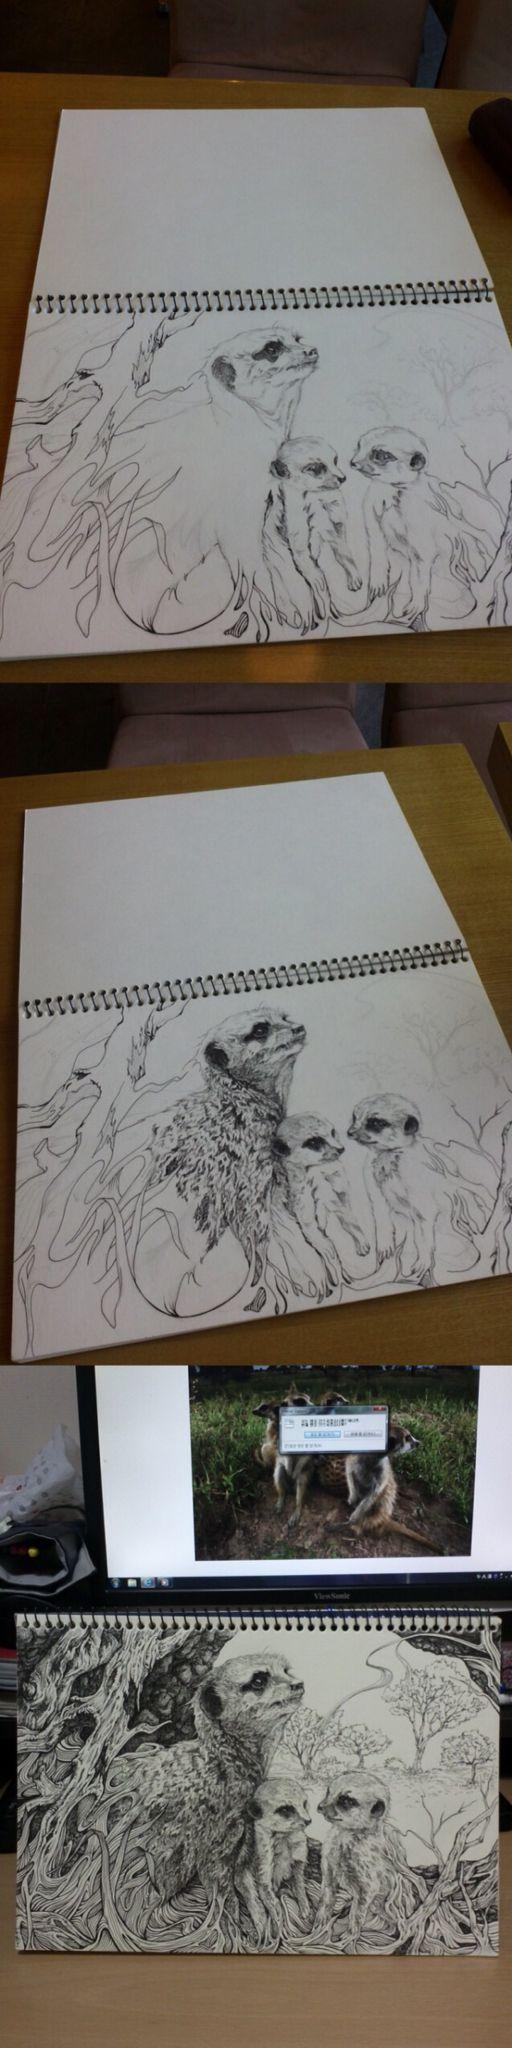 2012 SOKI 공모전 출품작04-meerkat 미어캣